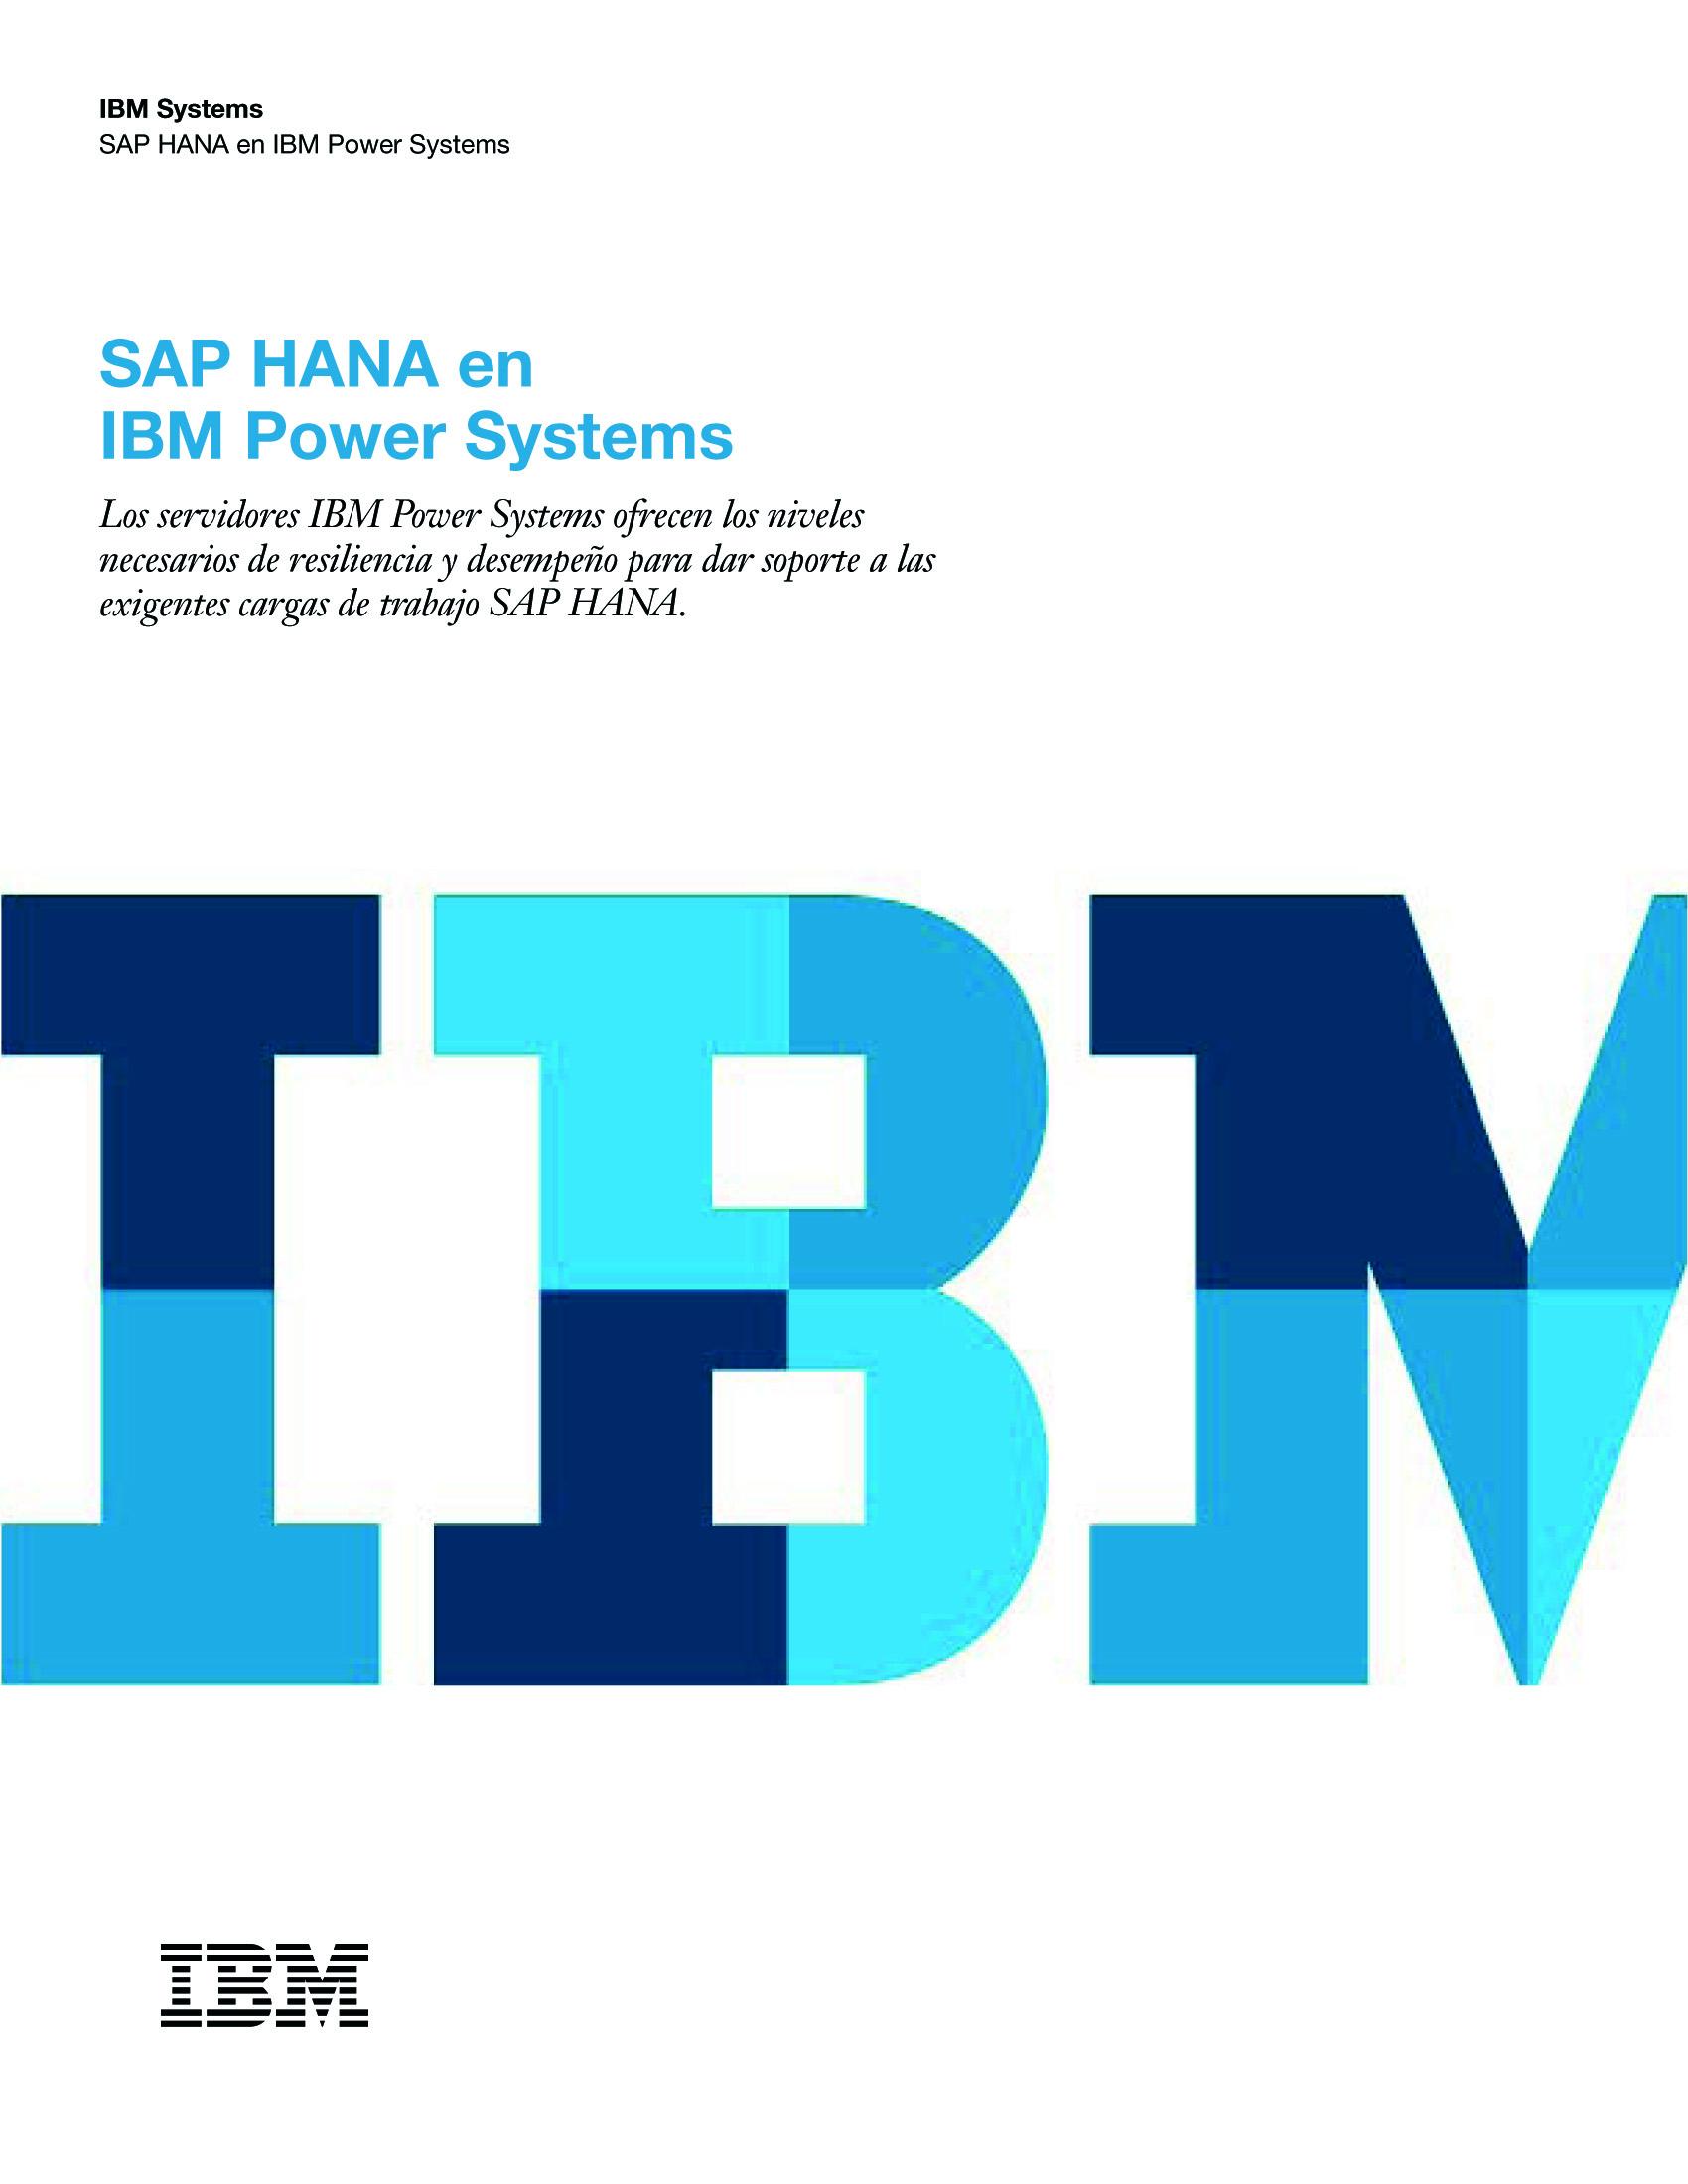 SAP HANA en IBM Power Systems